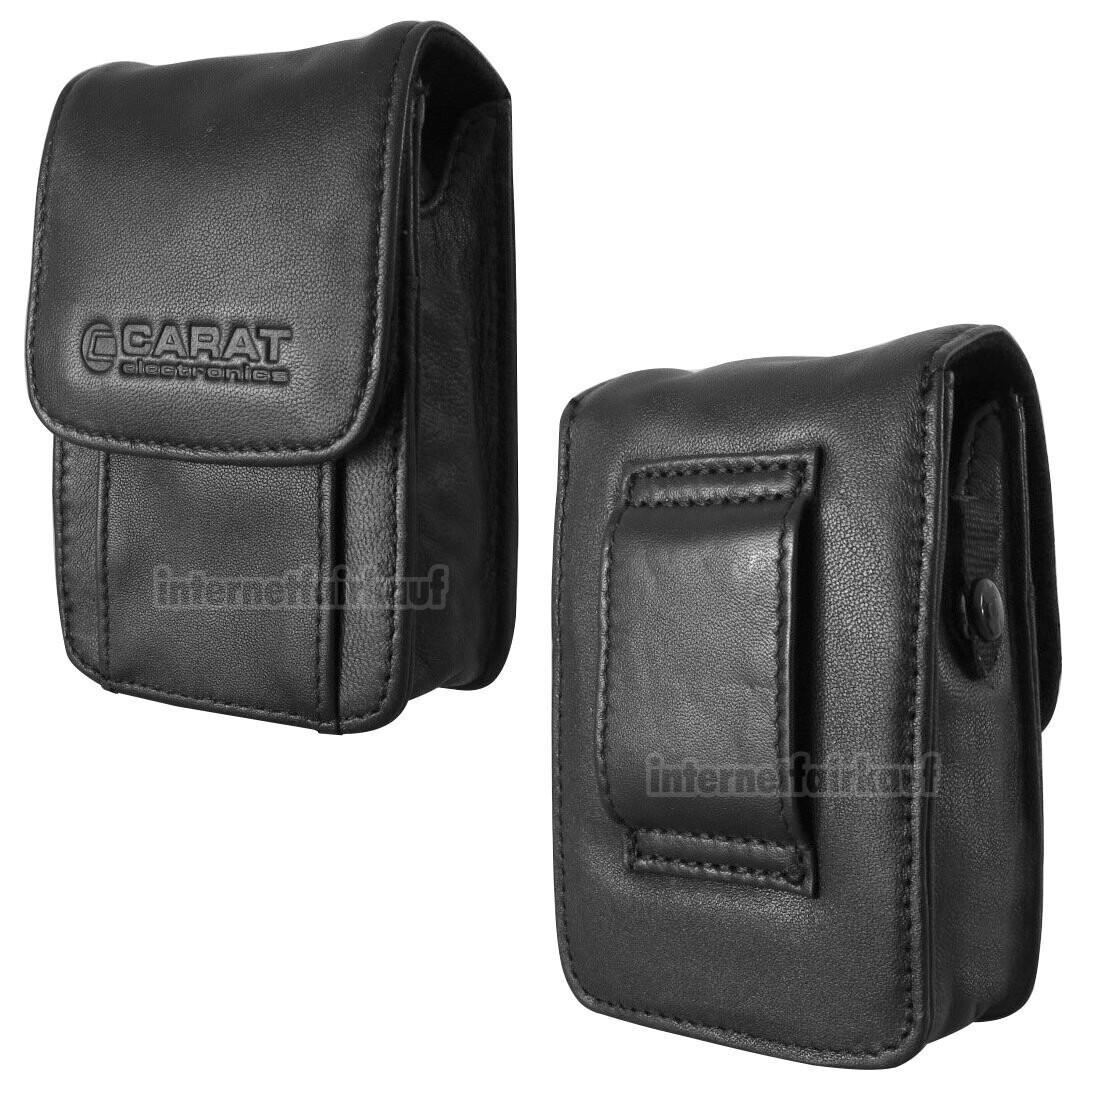 Kameratasche passend für Canon PowerShot SX220 HS SX230 HS - Leder Etui